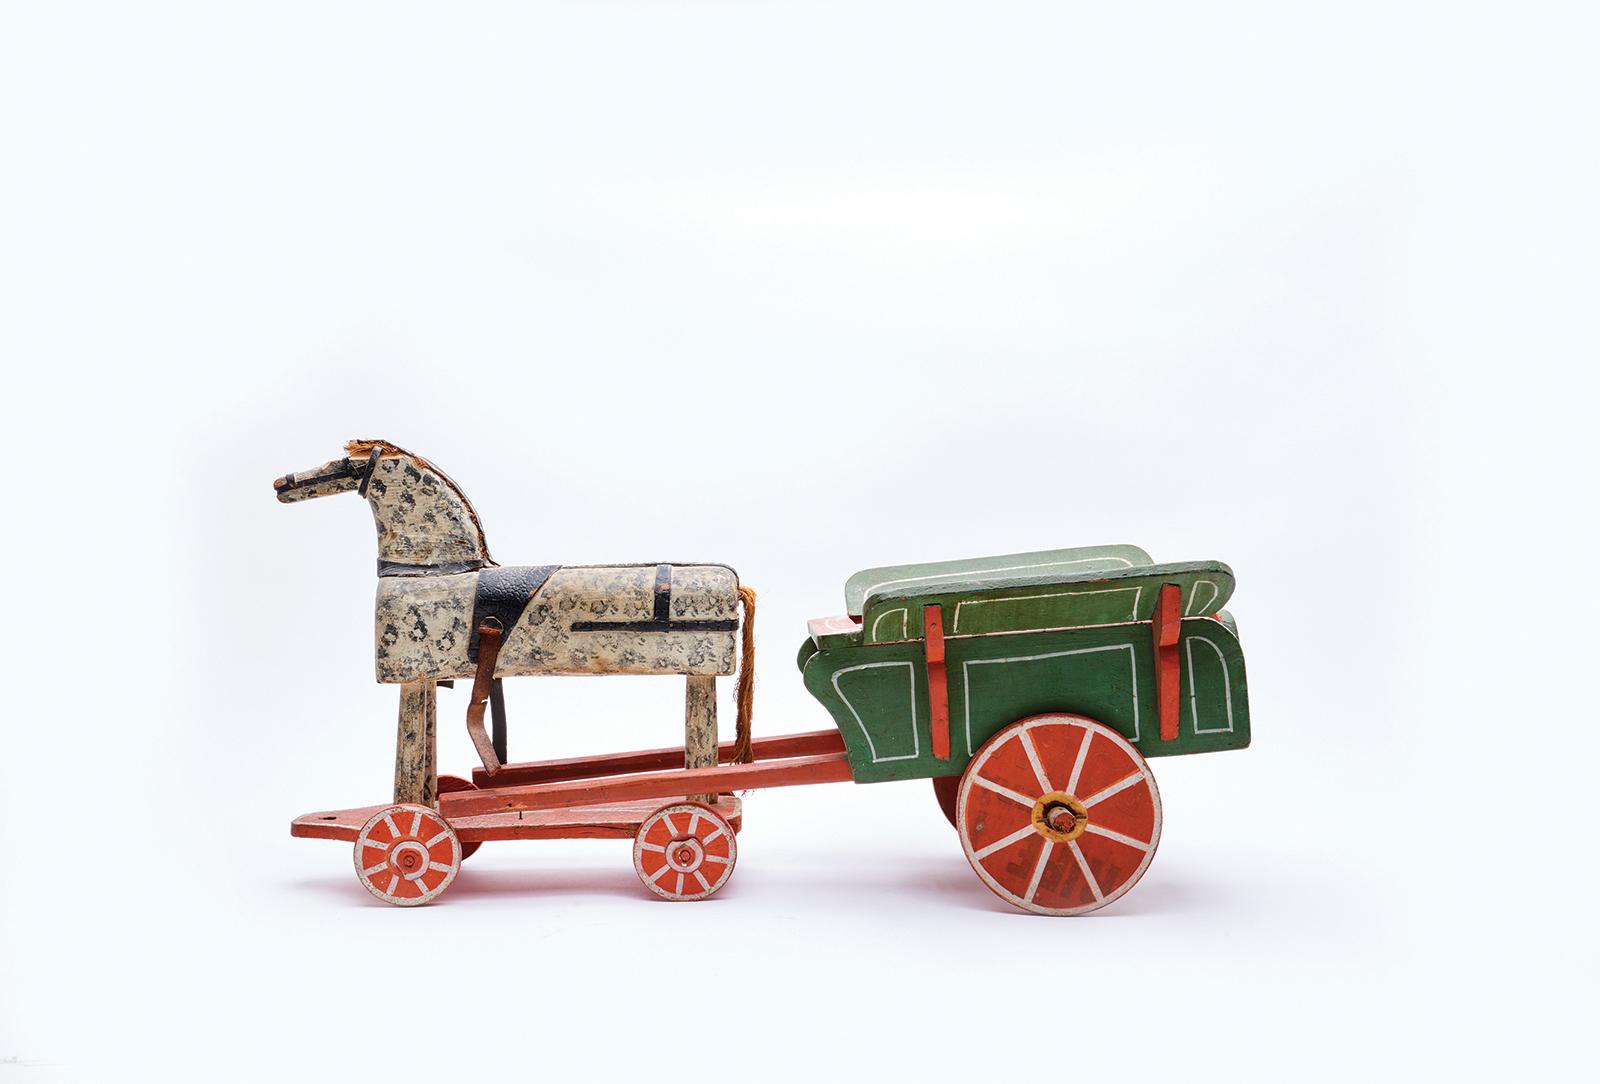 cashiers-historical-society-horses-and-cars-north-carolina